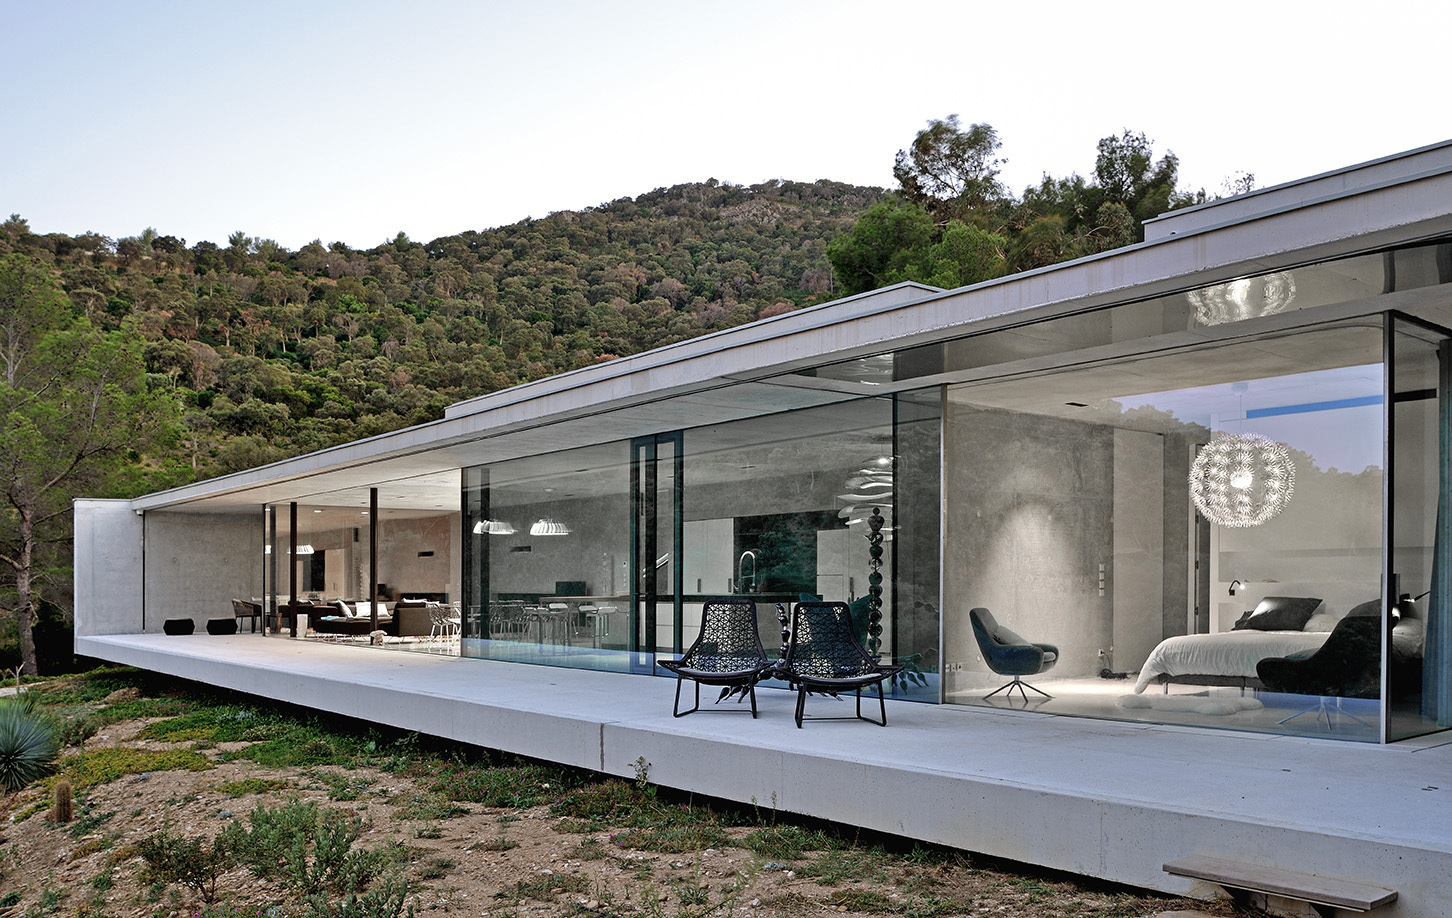 Plan De Masse Maison Moderne | Maison 3 Chambres Niors Fuzzbeed Hd ...